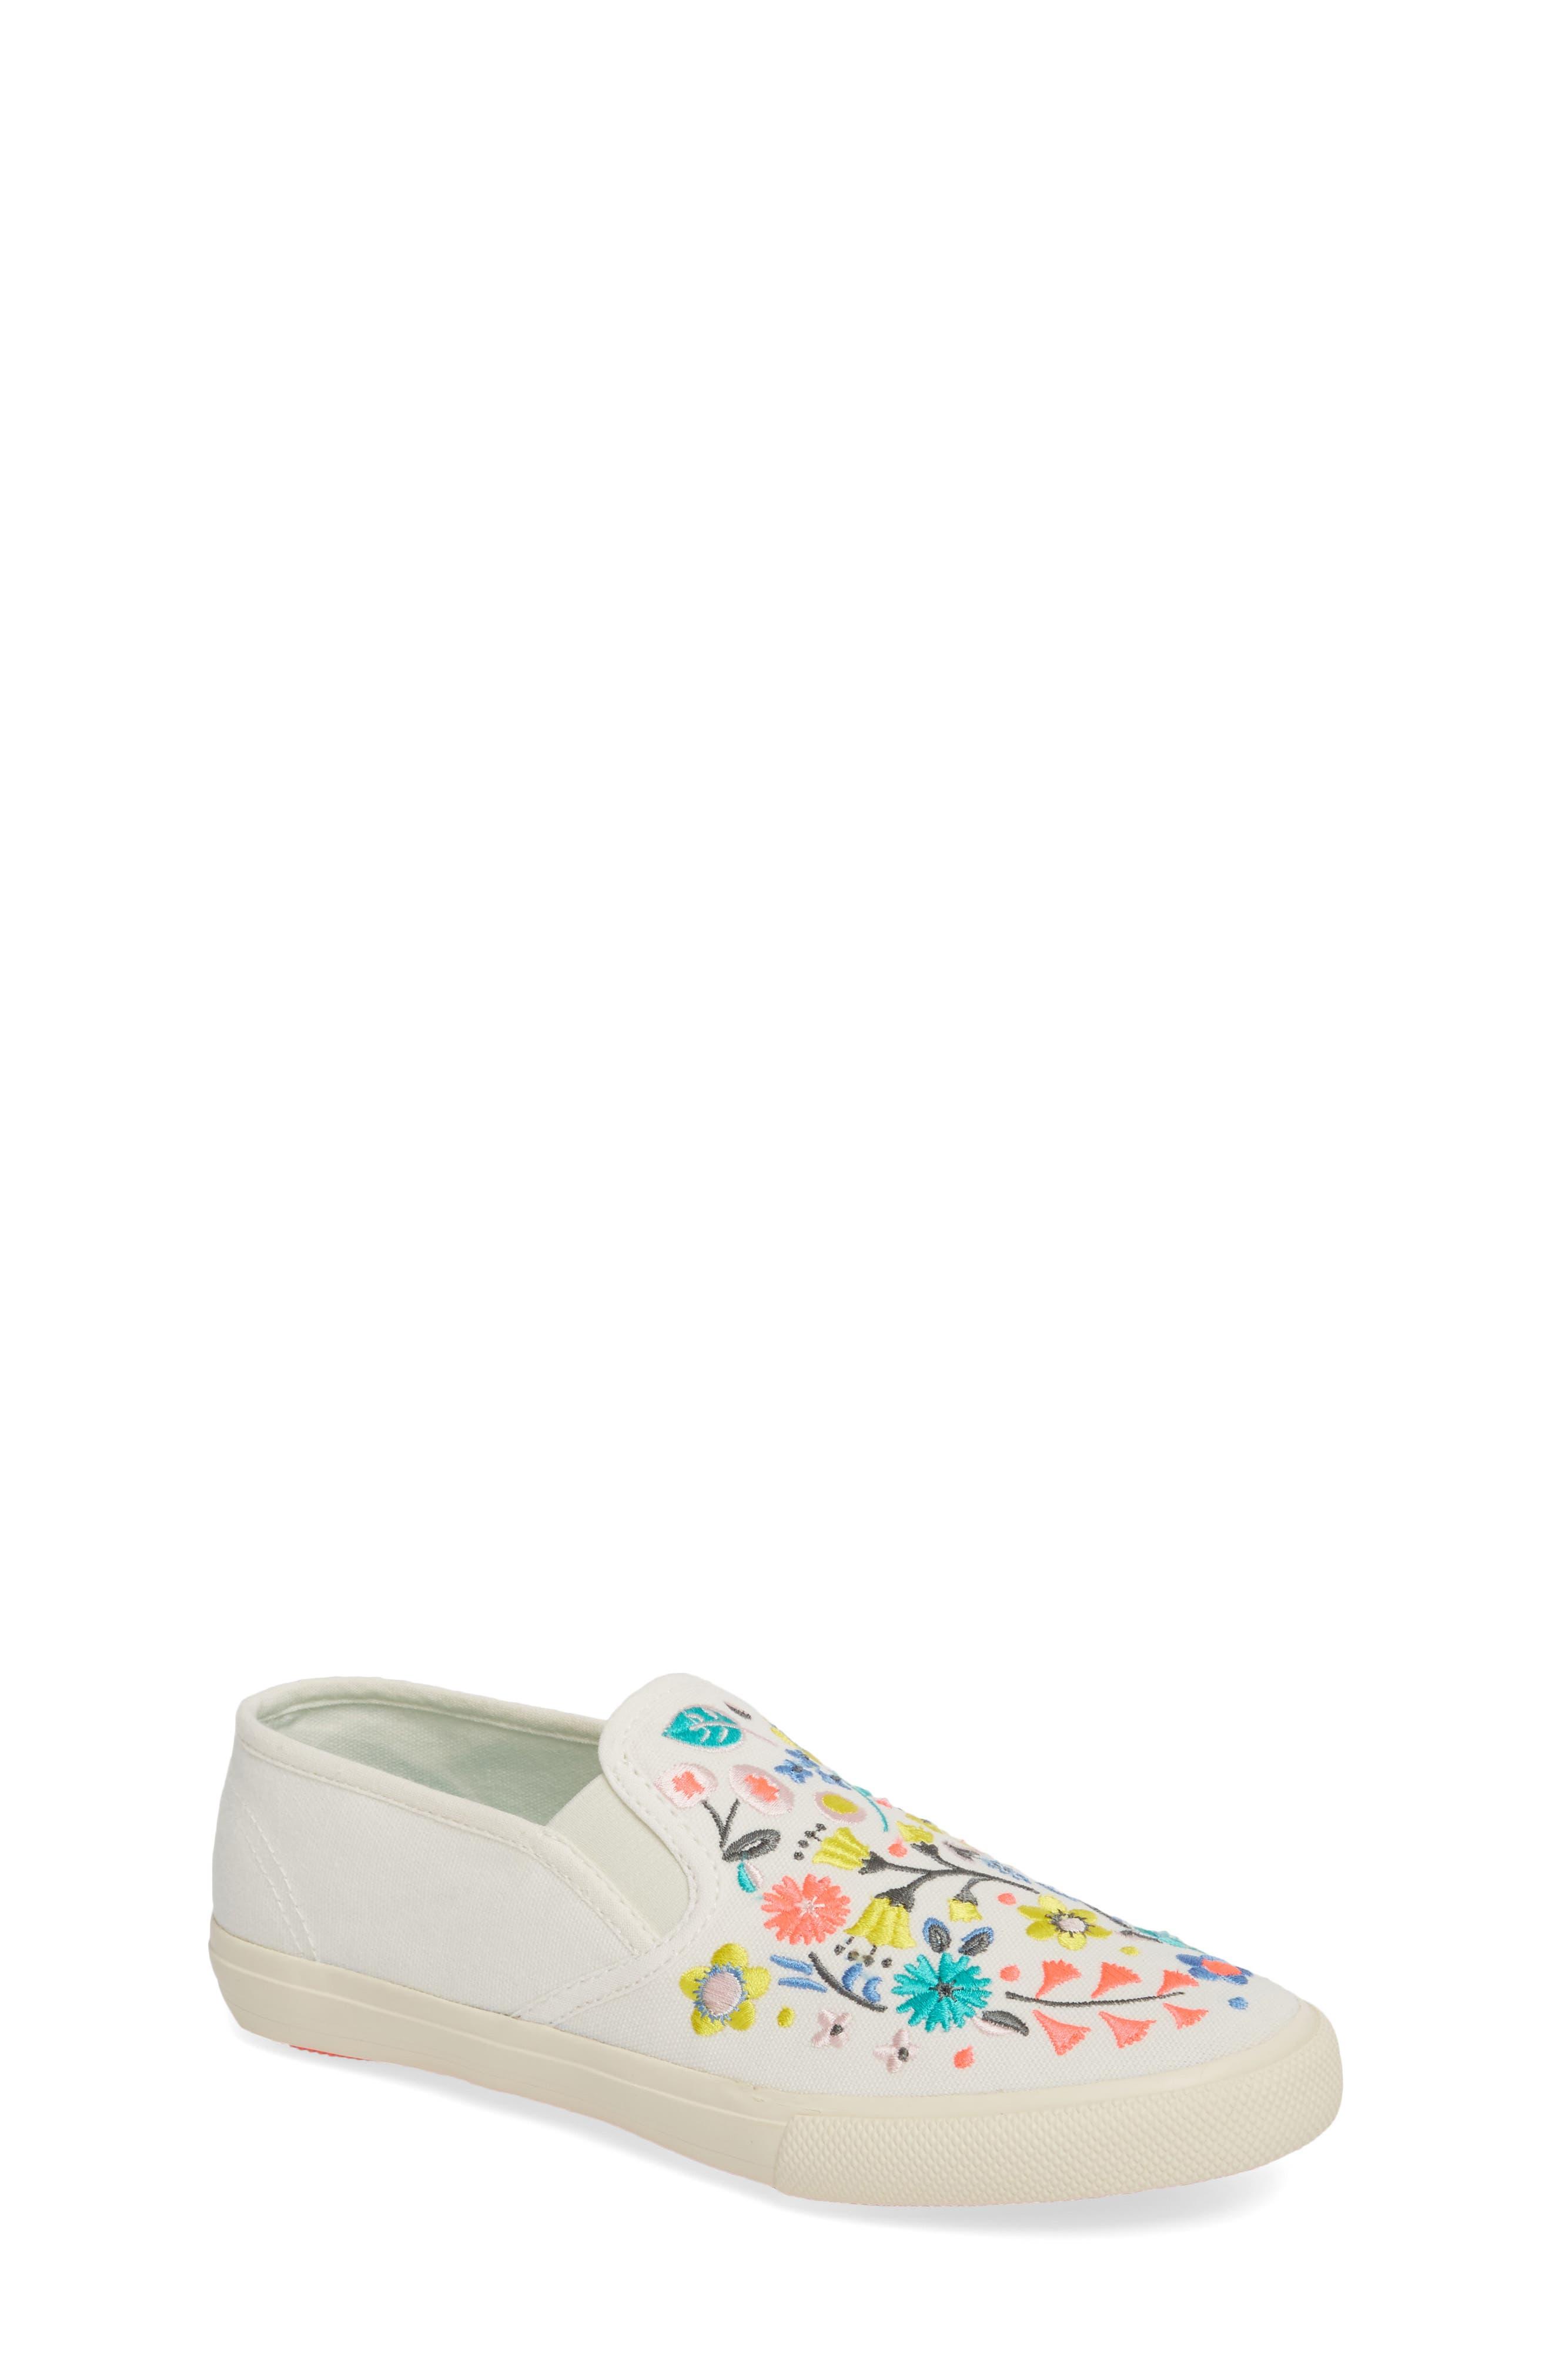 Boden Embroidered Slip-On Sneaker,                             Main thumbnail 1, color,                             Ecru